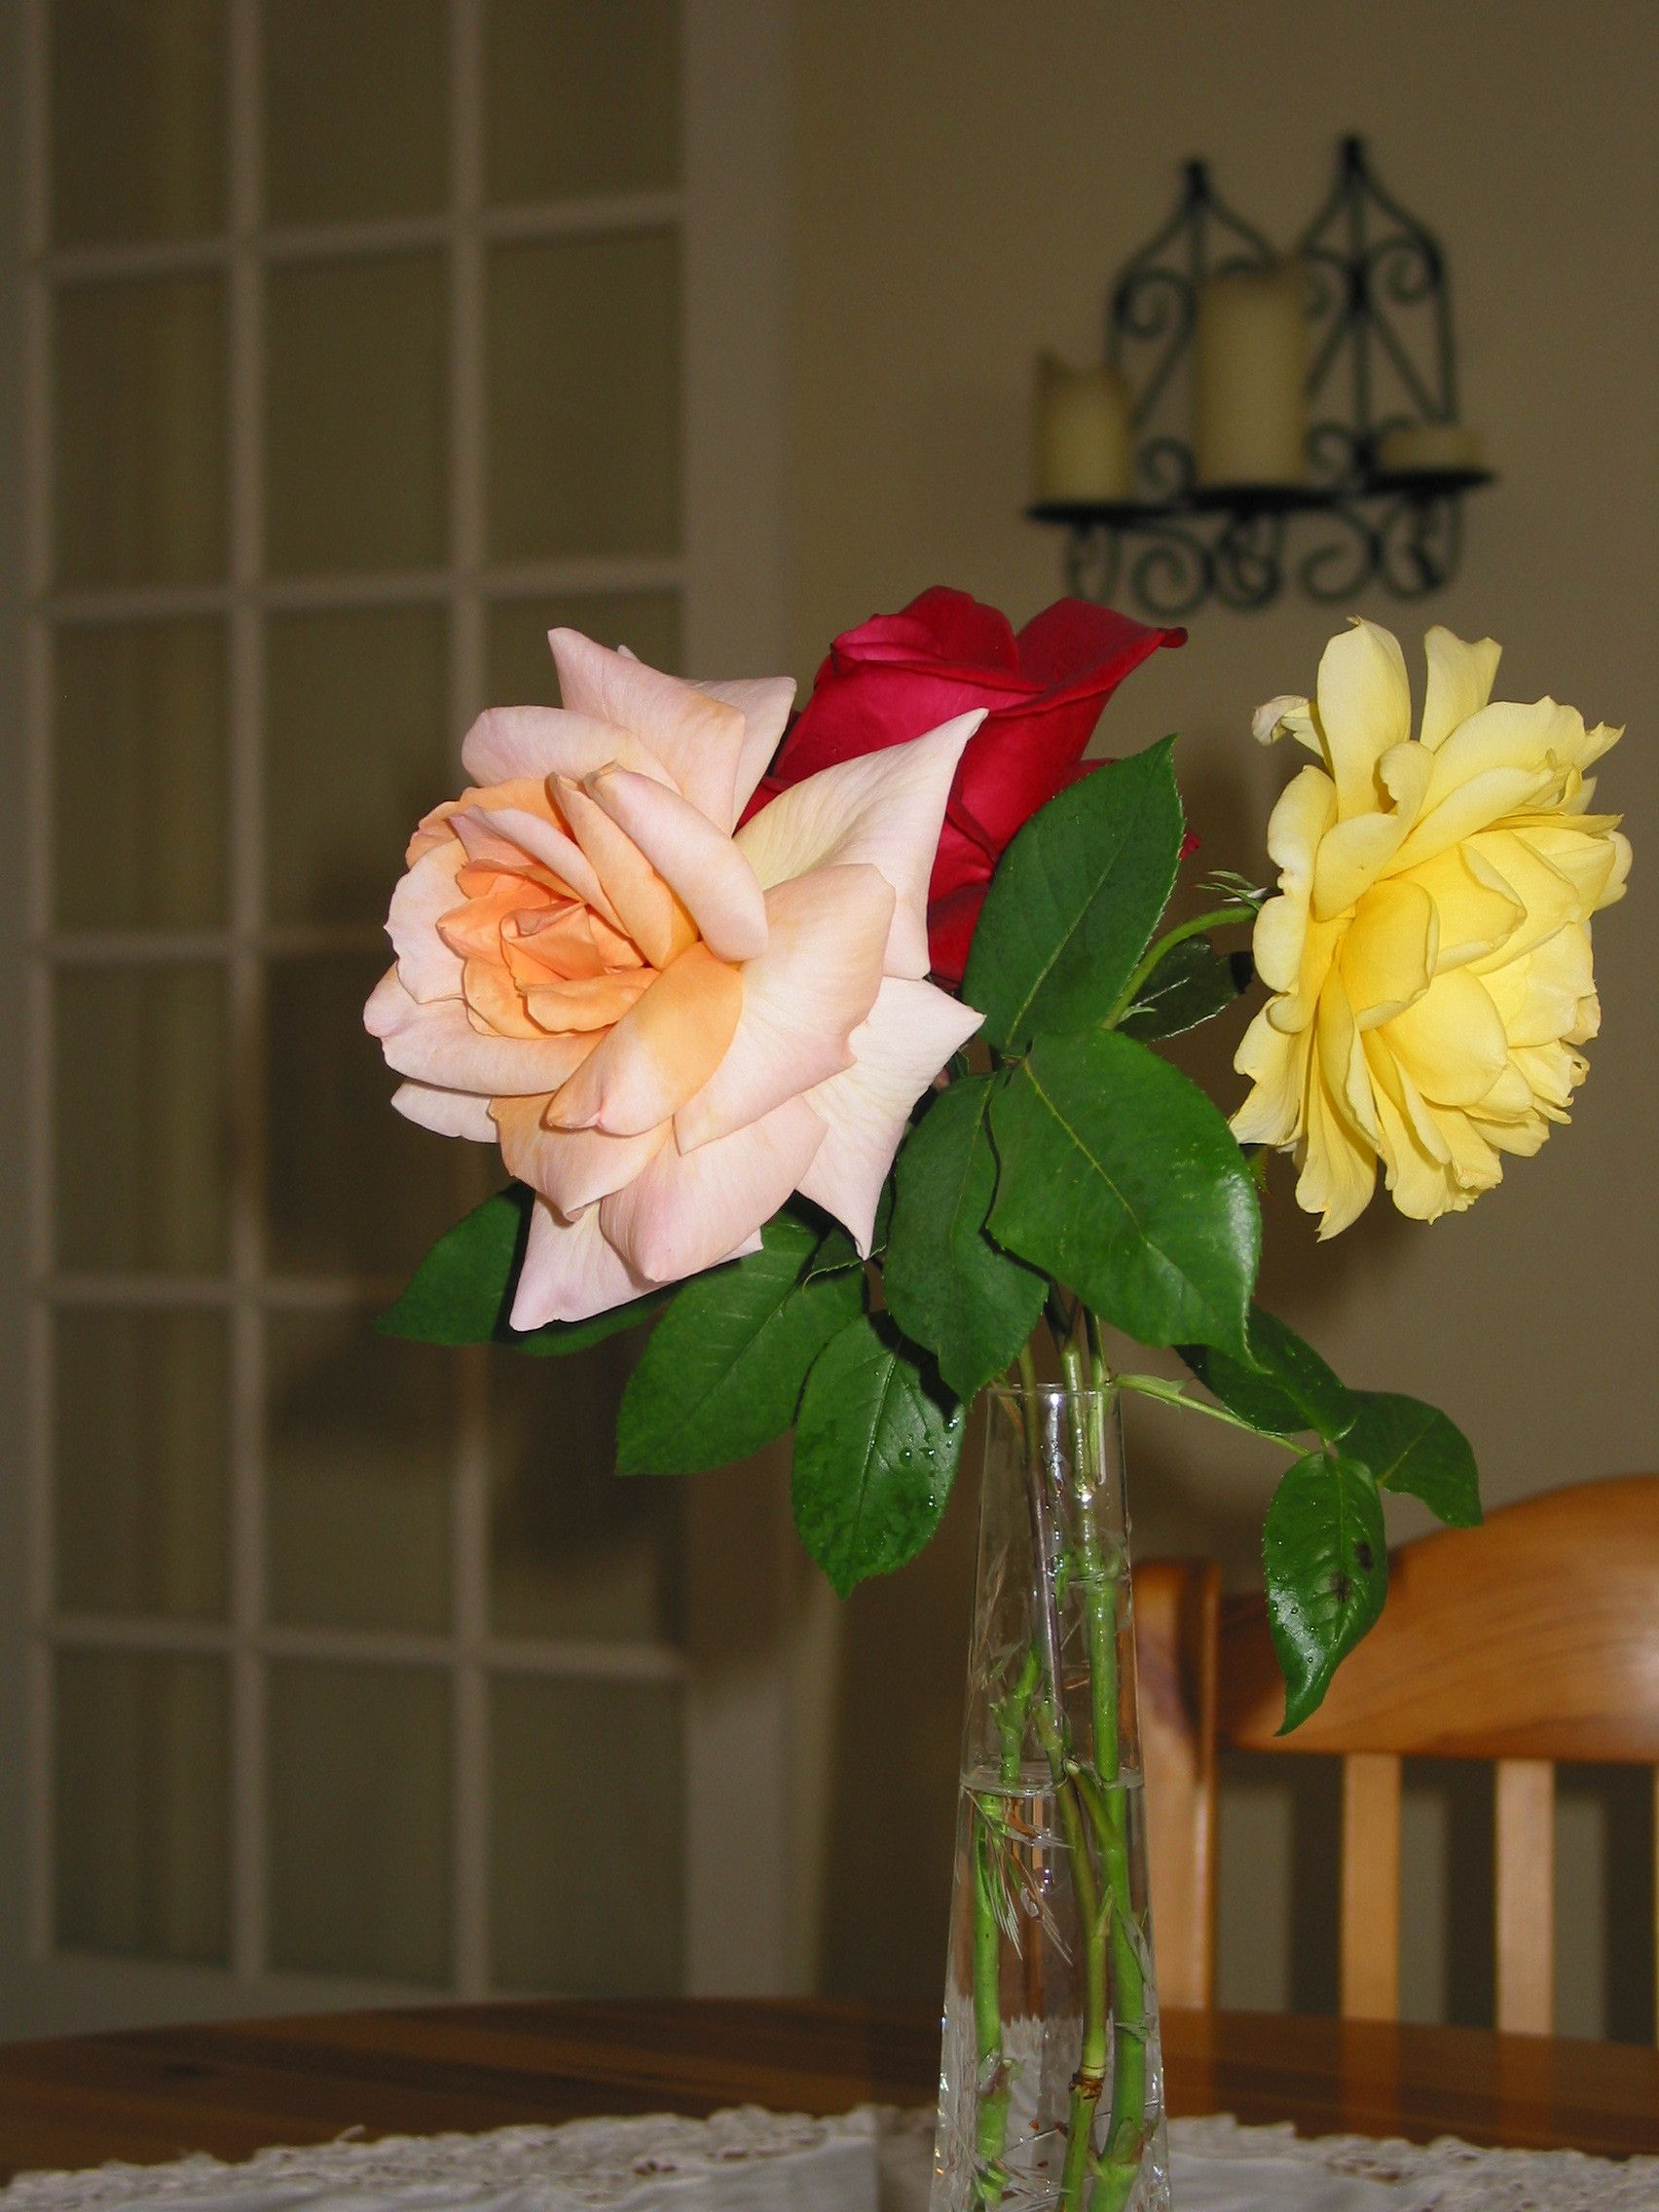 Roses for Vive le jardin 36250 saint maur